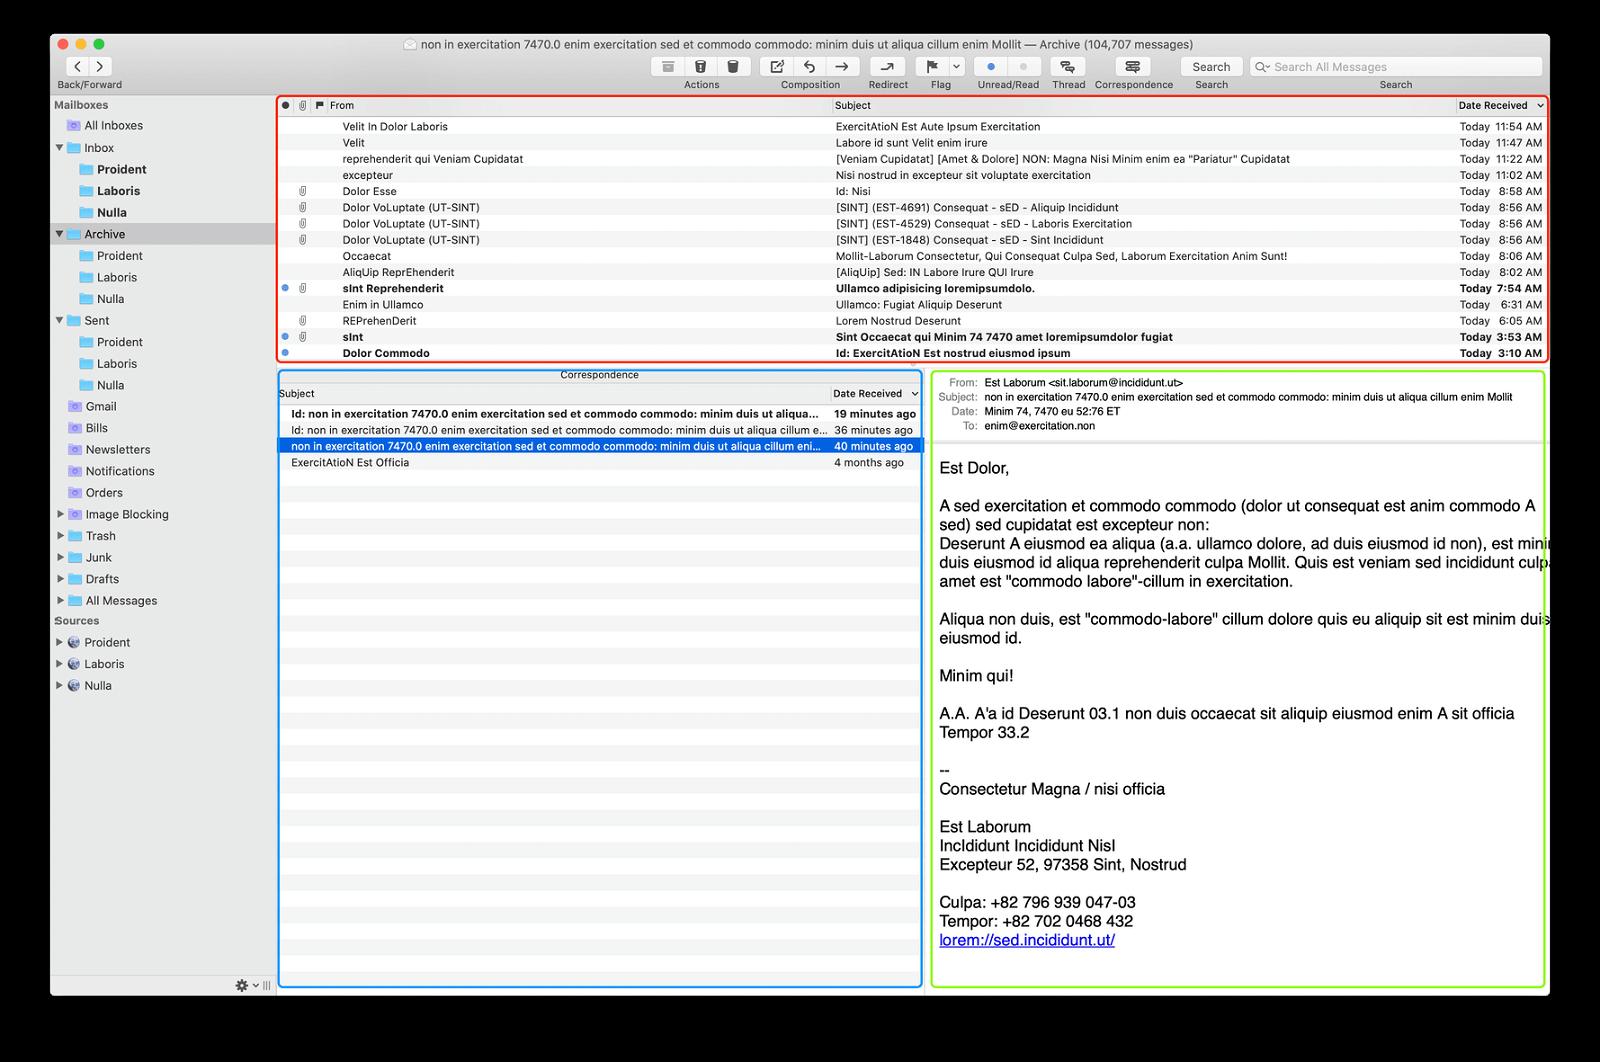 MailMate window